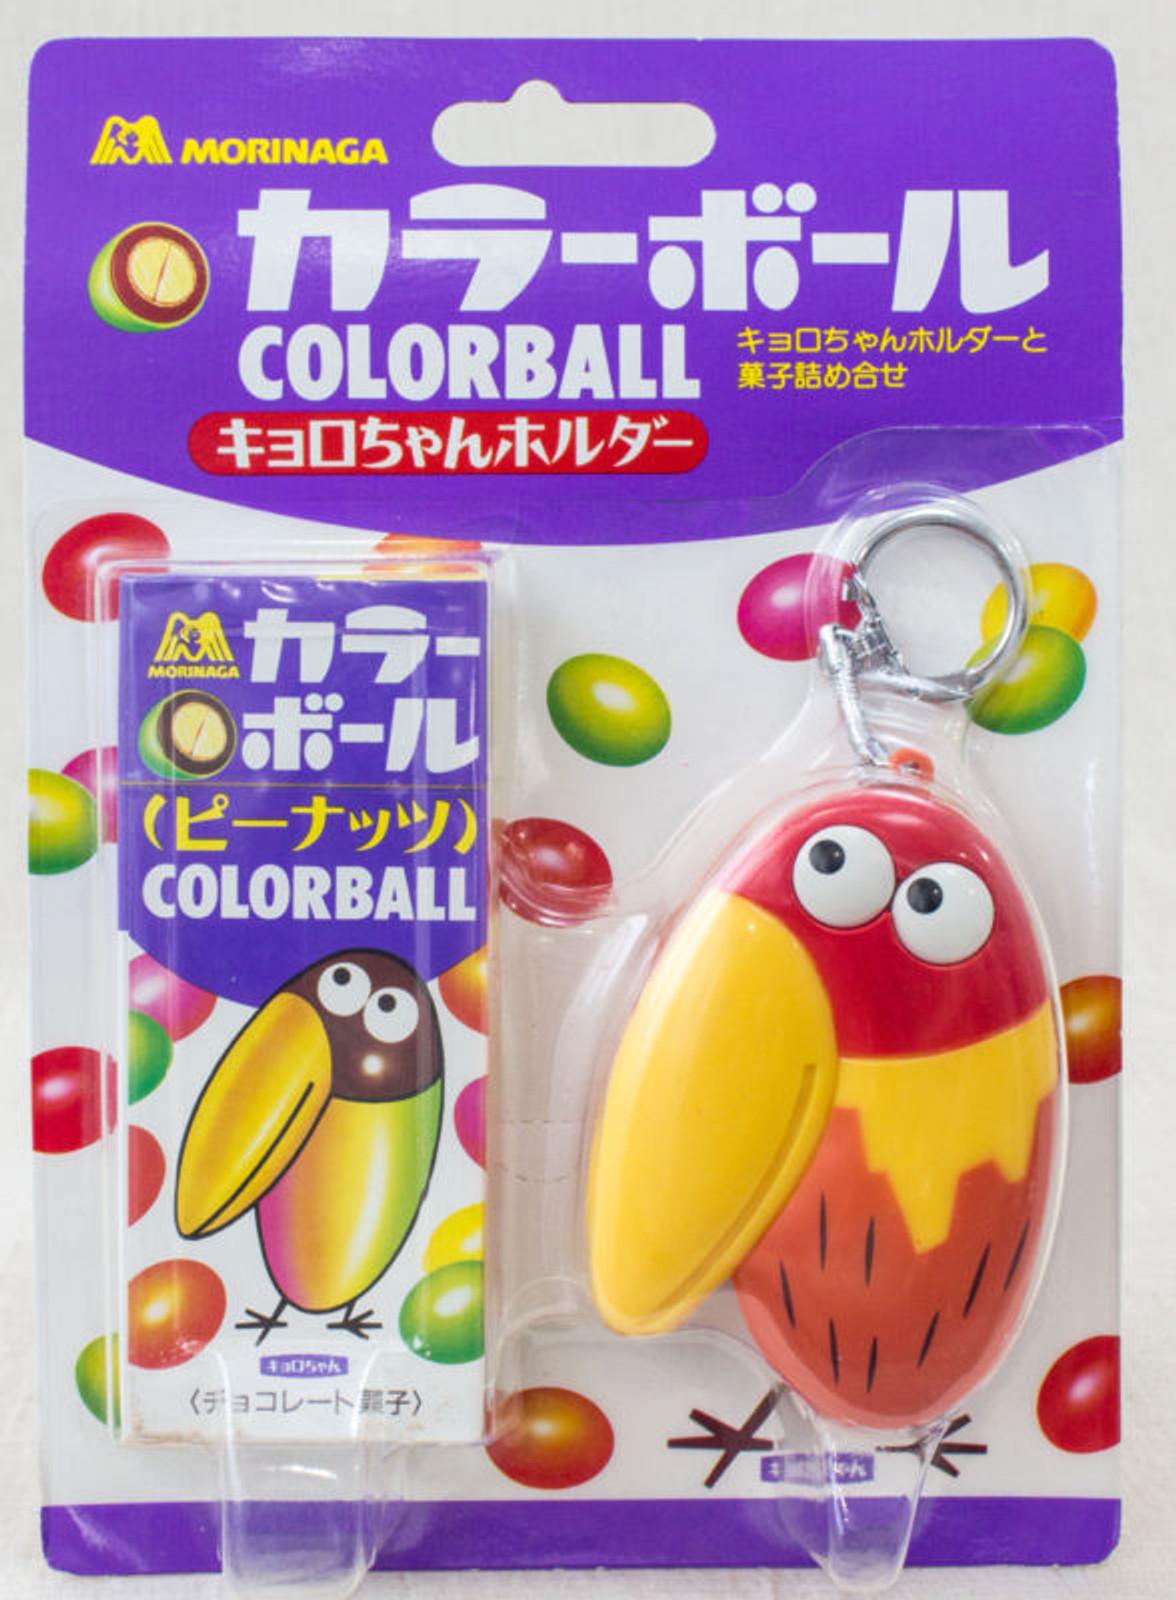 Kyoro-Chan Colorball Choco Ball Holder Case Key Chain Morinaga JAPAN ANIME MANGA